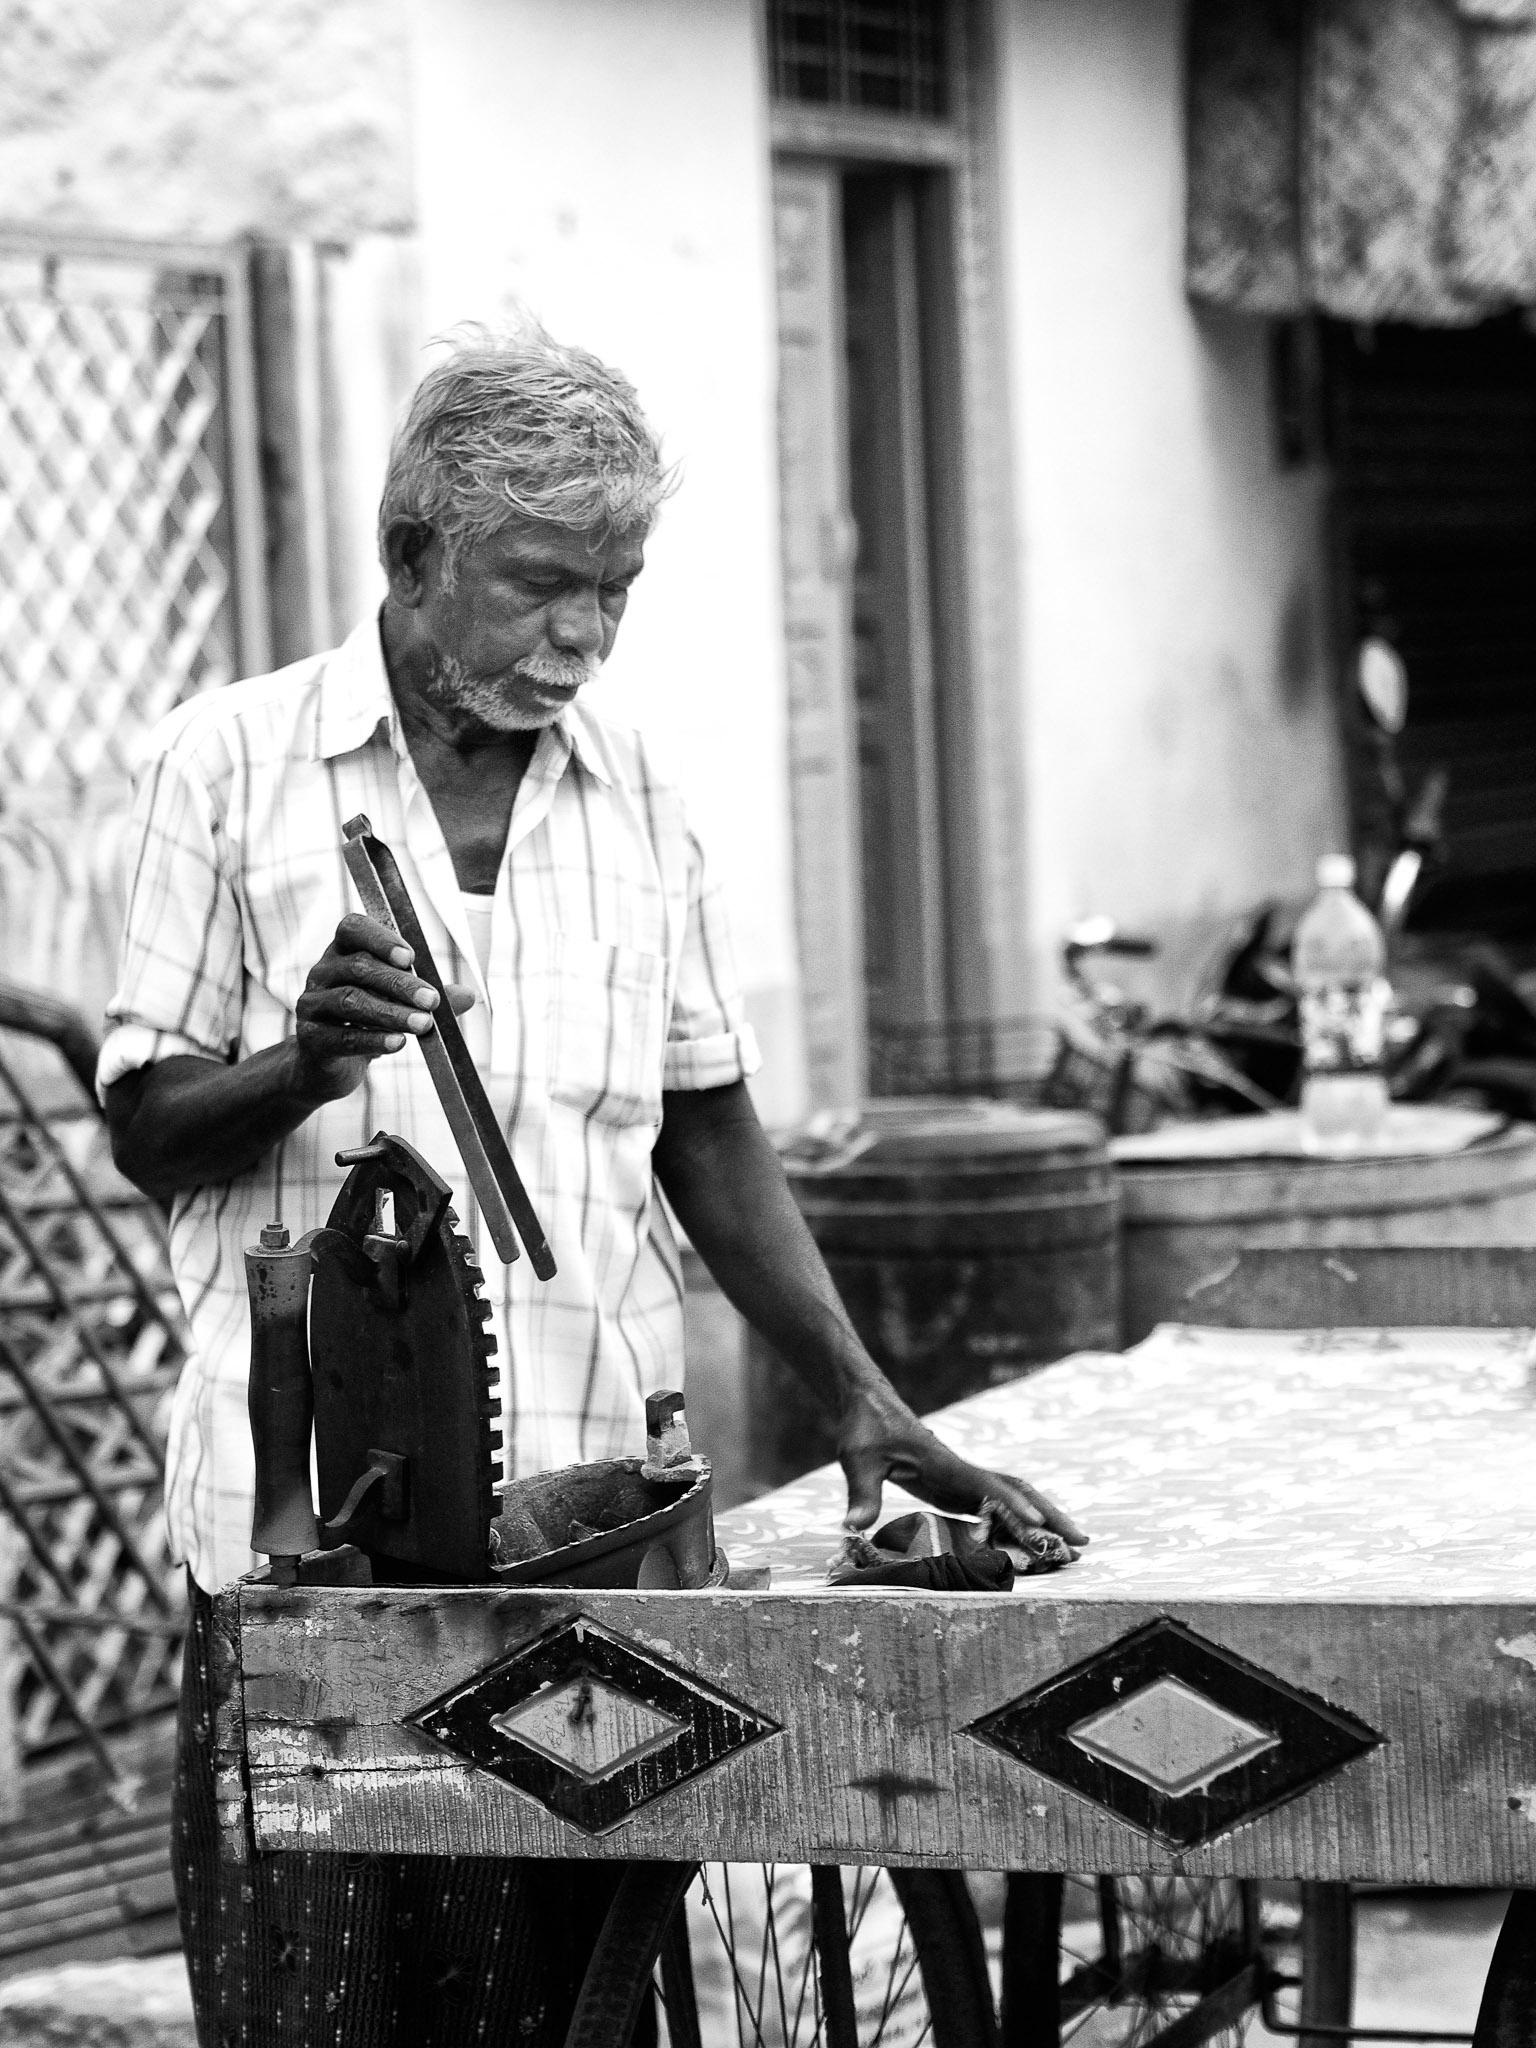 An Ironing man attending hot charcoals with a pincer on his iron box, Virudhunagar, Tamil Nadu, India